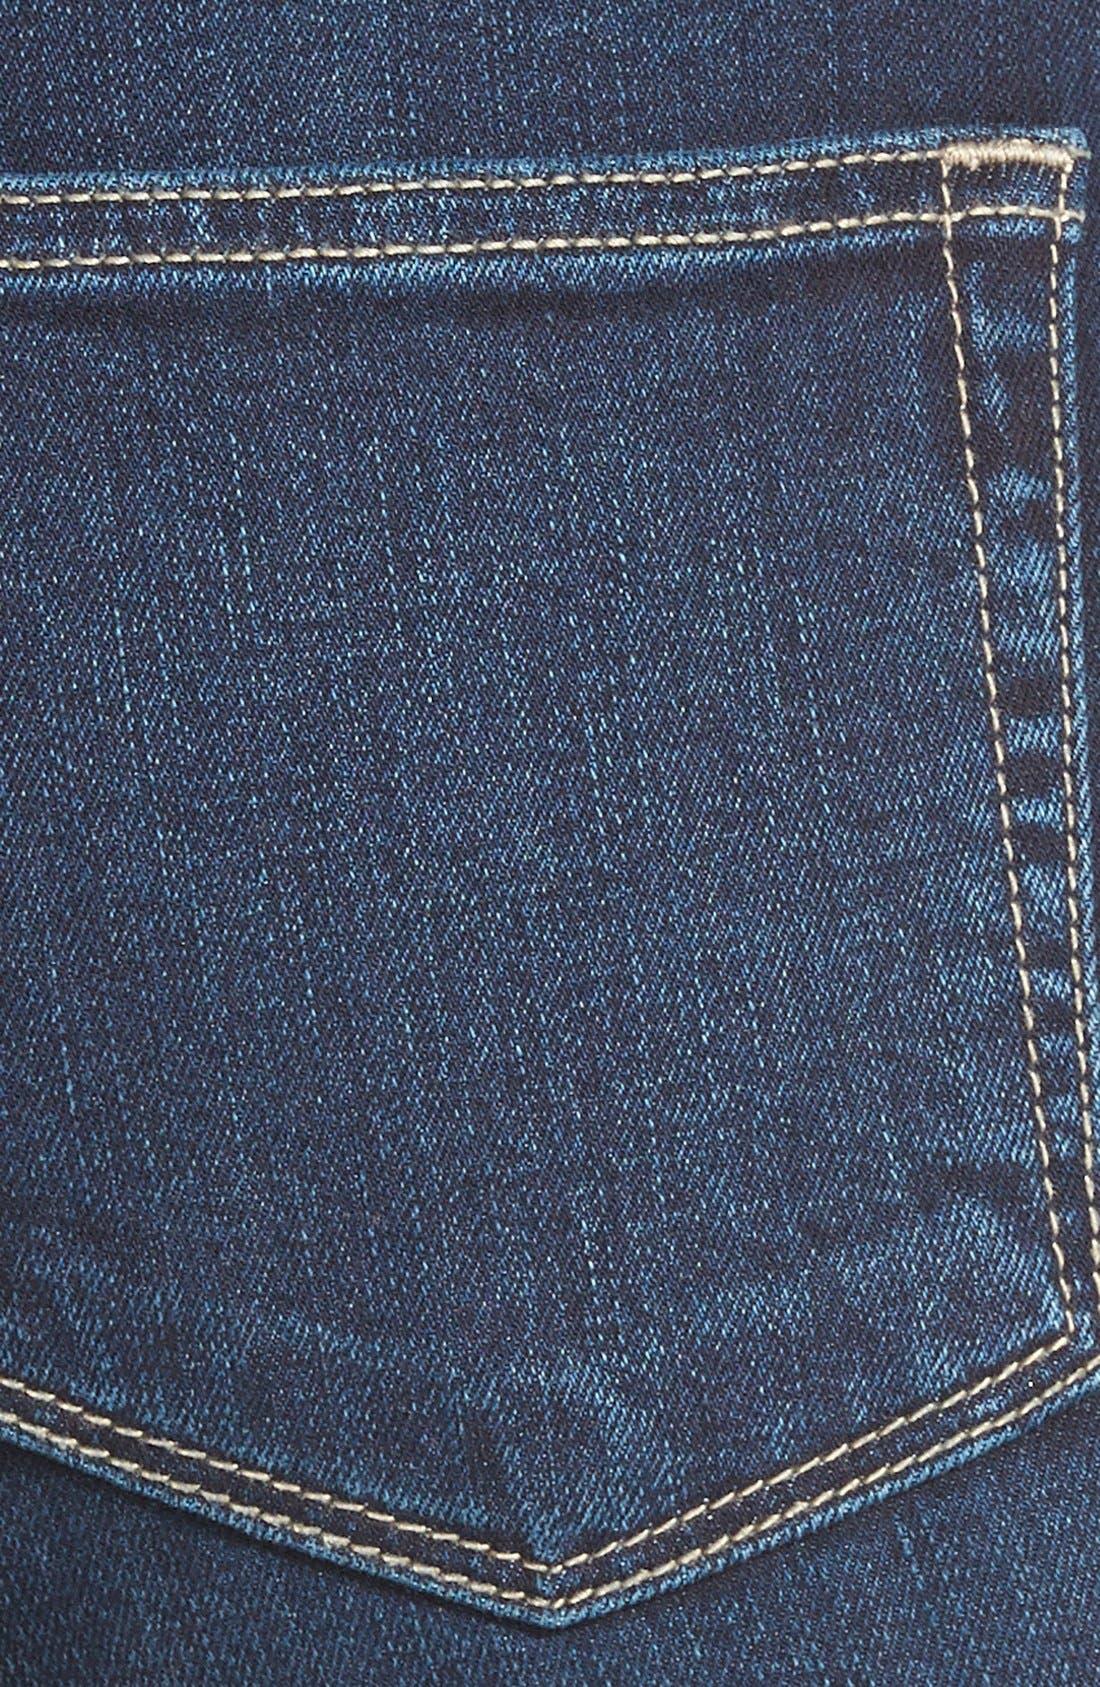 High Rise Flare Leg Jeans,                             Alternate thumbnail 3, color,                             400